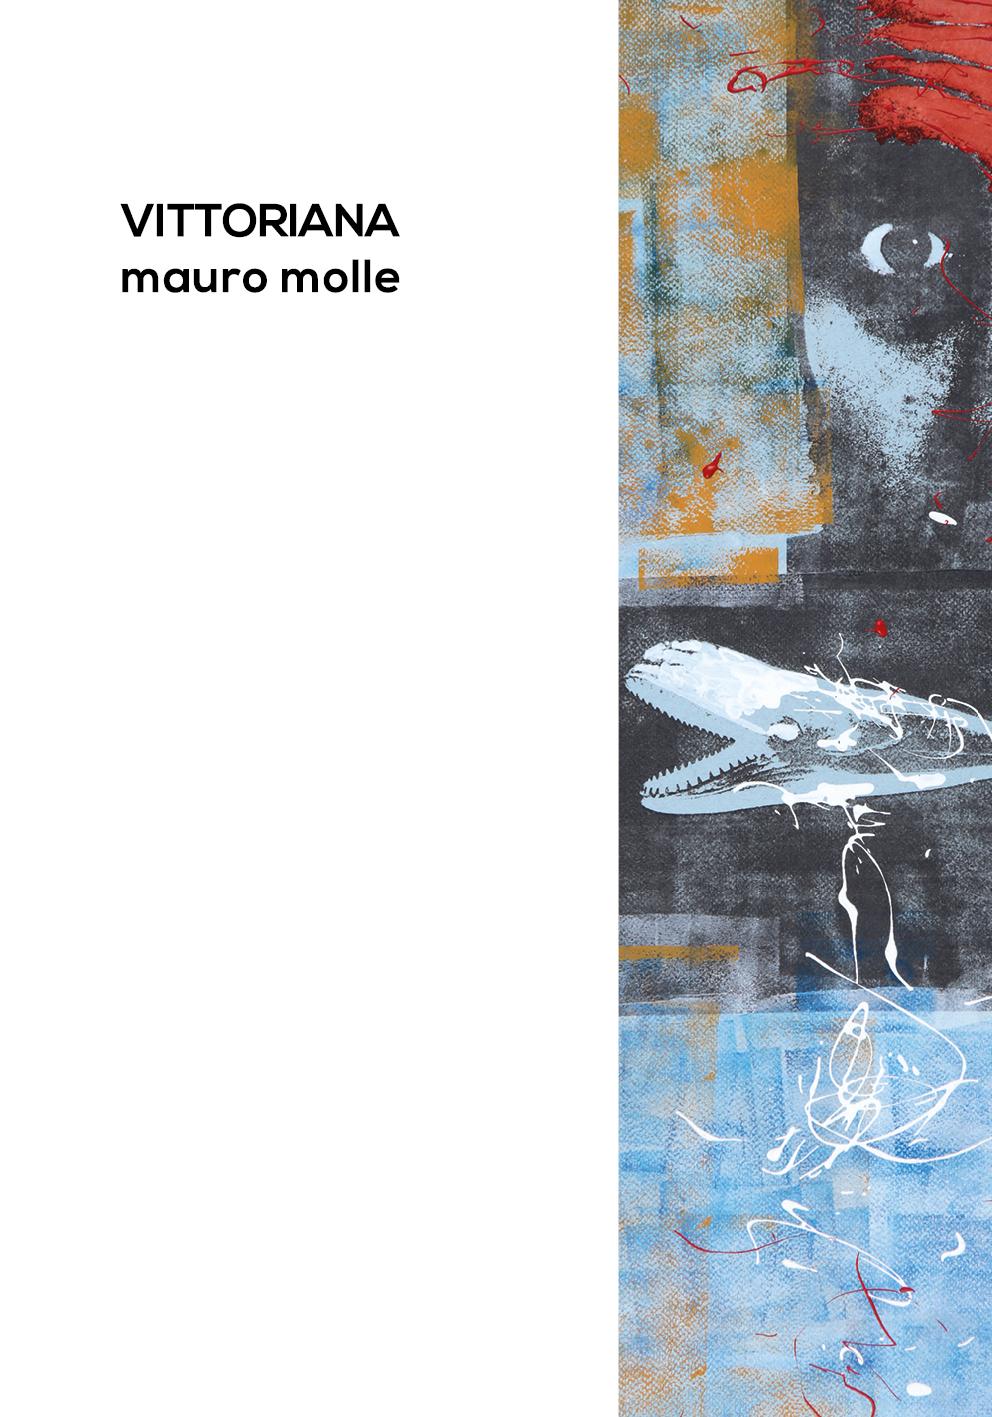 Vittoriana - Mauro Molle